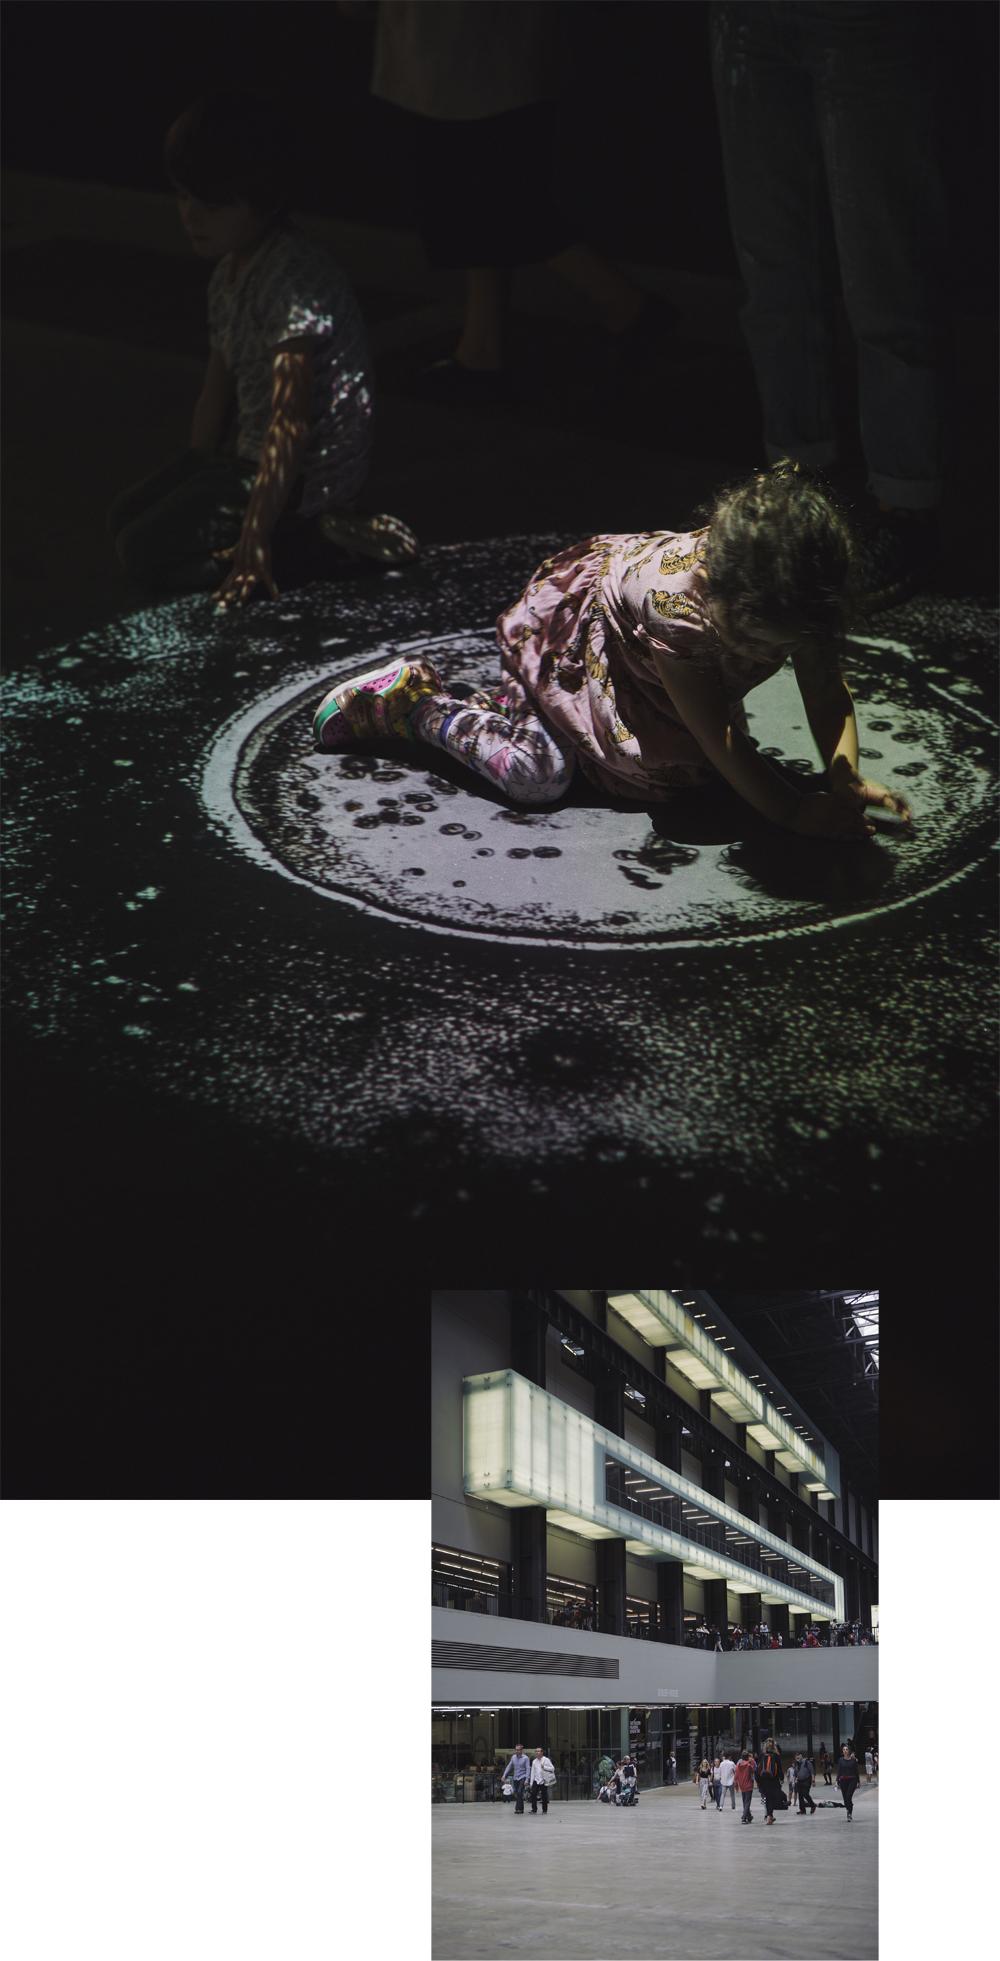 12_London_by_Amelie_Niederbuchner, London, Visual Diary, shot by Amelie Niederbuchner, photographer from Munich, blog The Curly Head